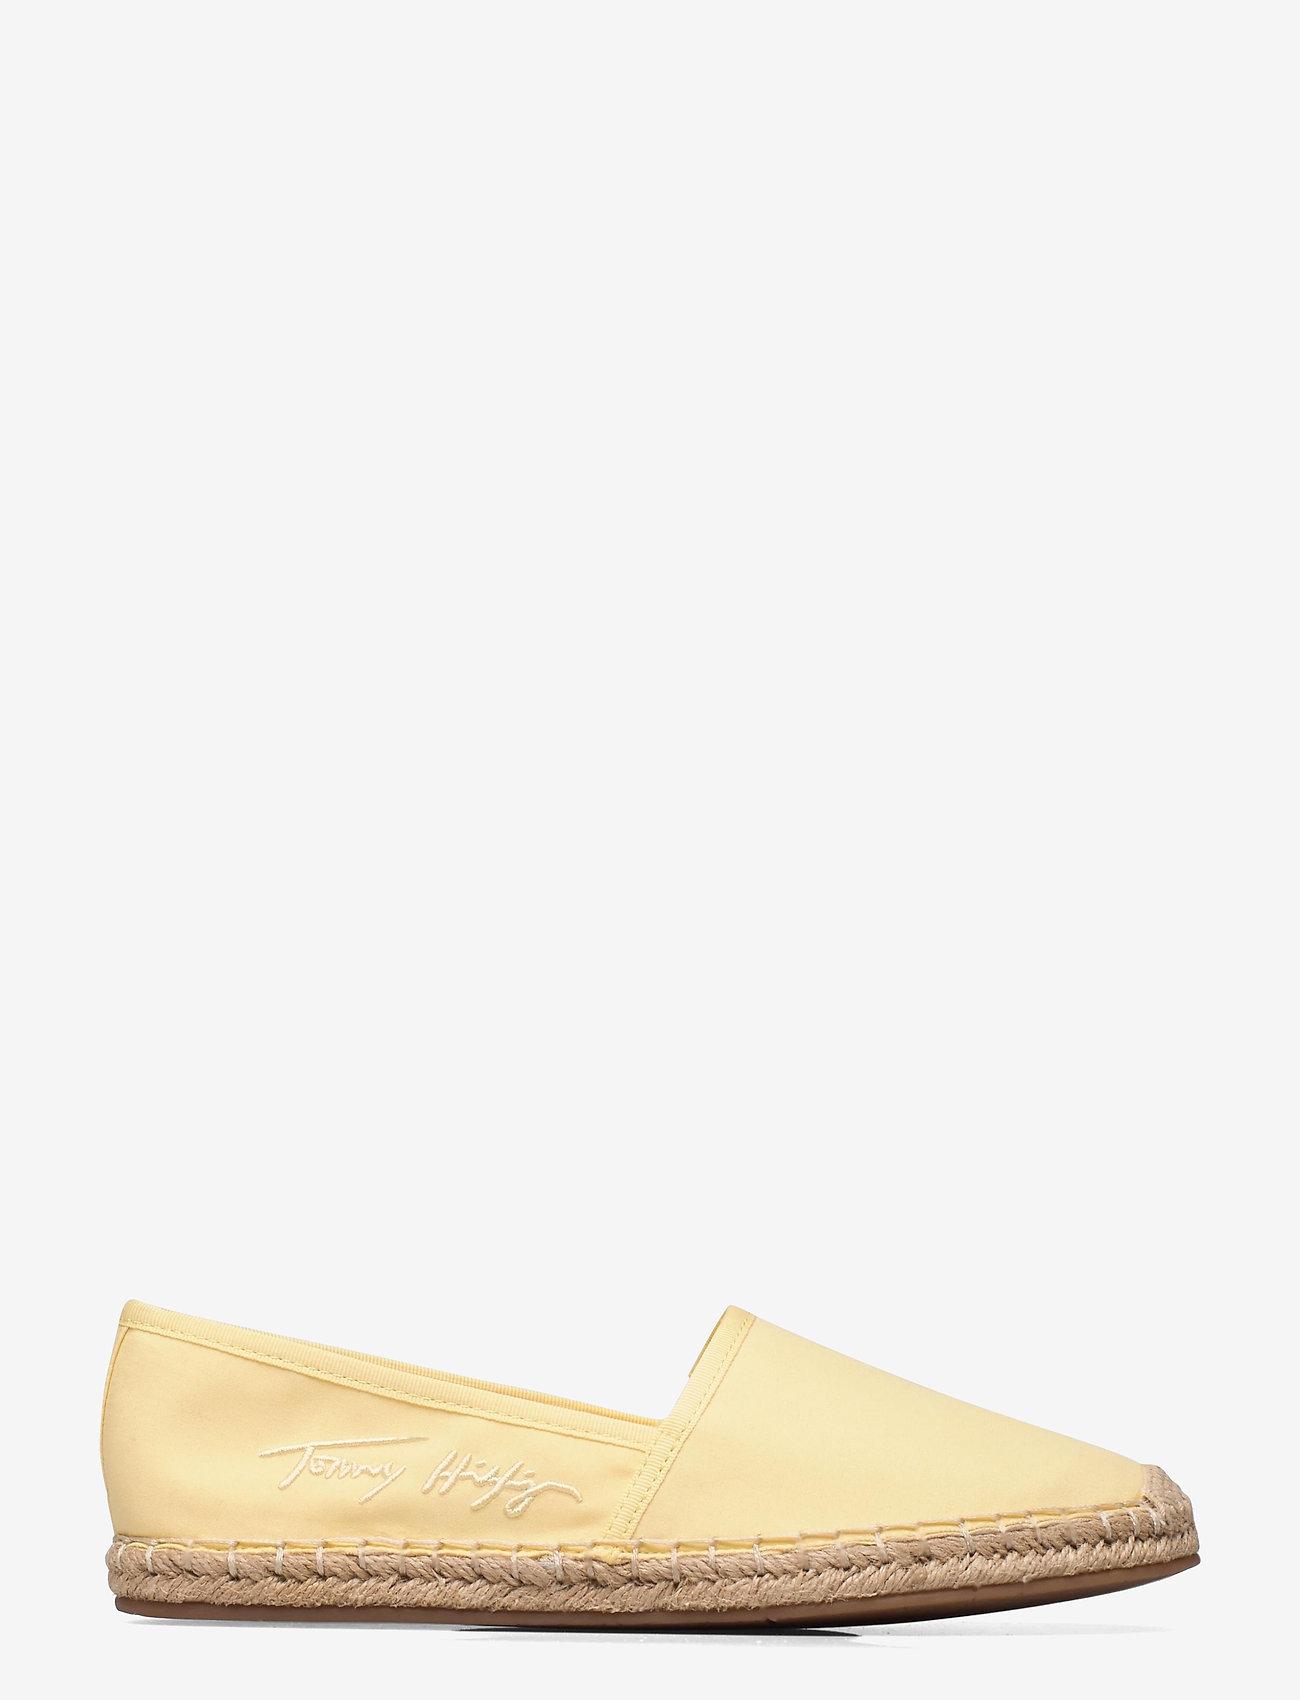 Tommy Hilfiger - TH SIGNATURE ESPADRILLE - platta espadriller - delicate yellow - 0